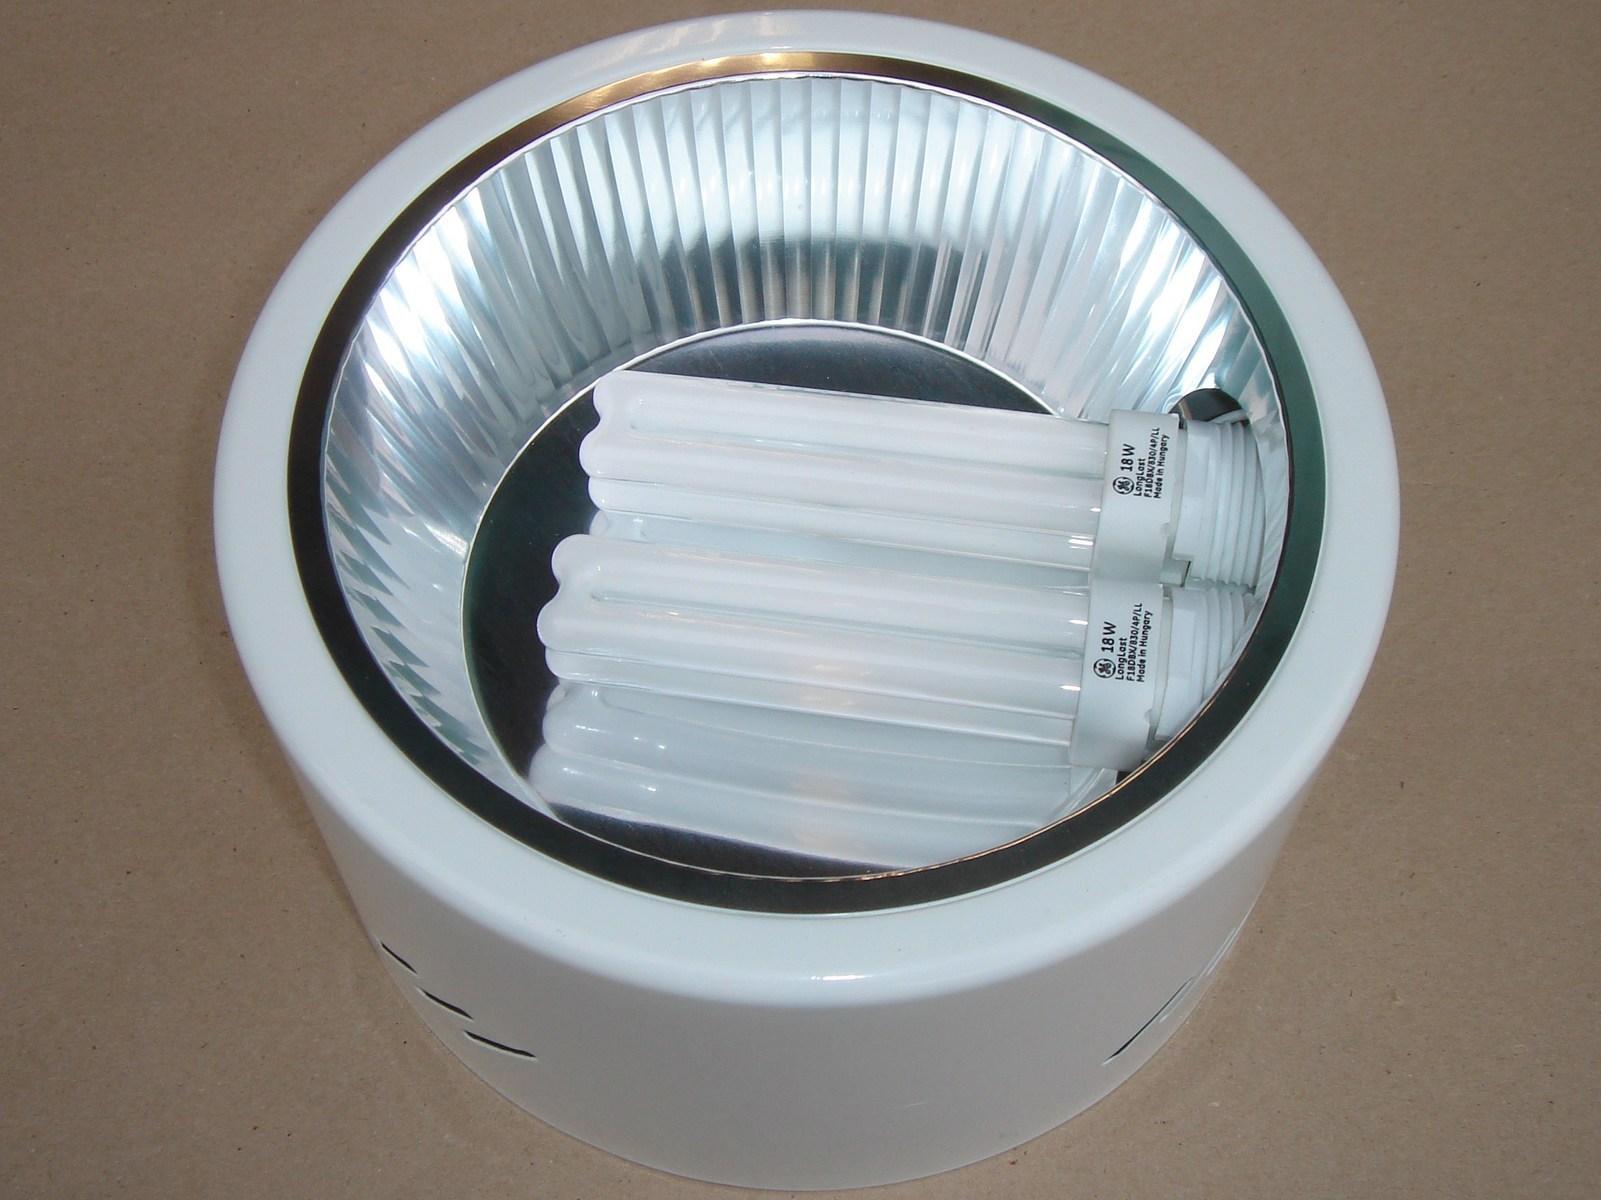 Valgusti 2 x 18 W, Sft Lighting